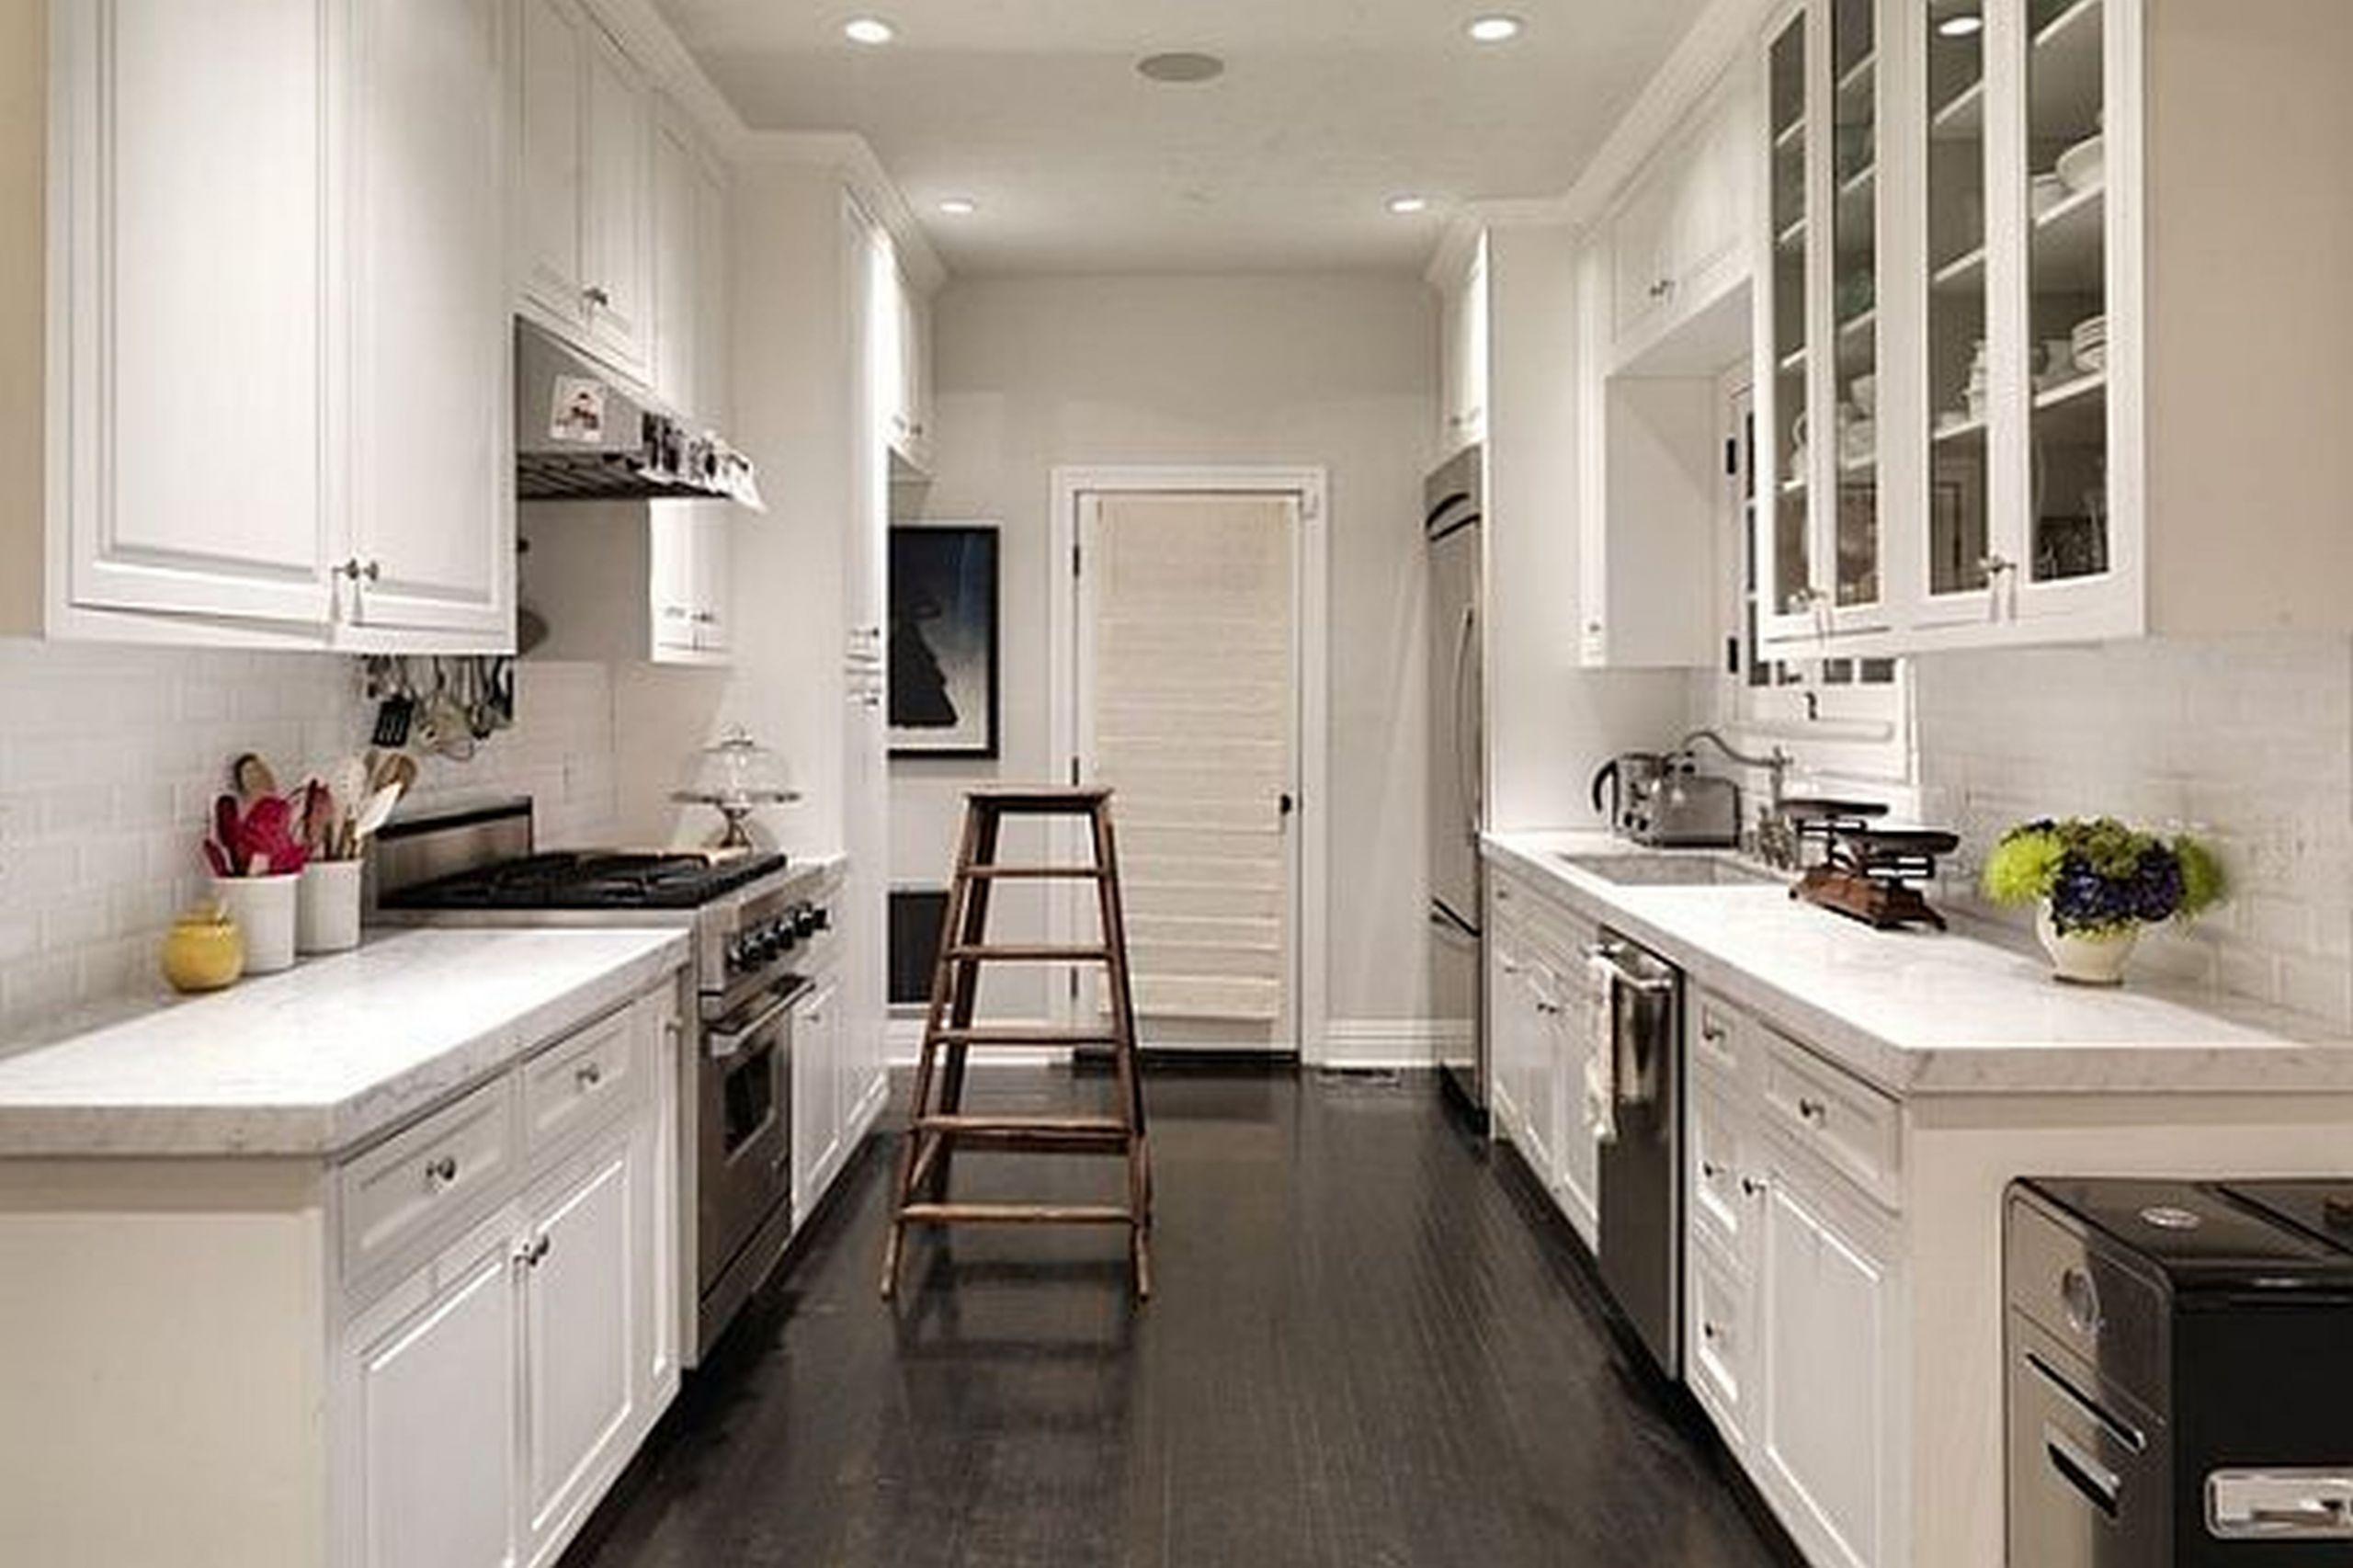 Small Narrow Kitchen Ideas  Simple Kitchens Small Kitchen Design Layout Ideas Best